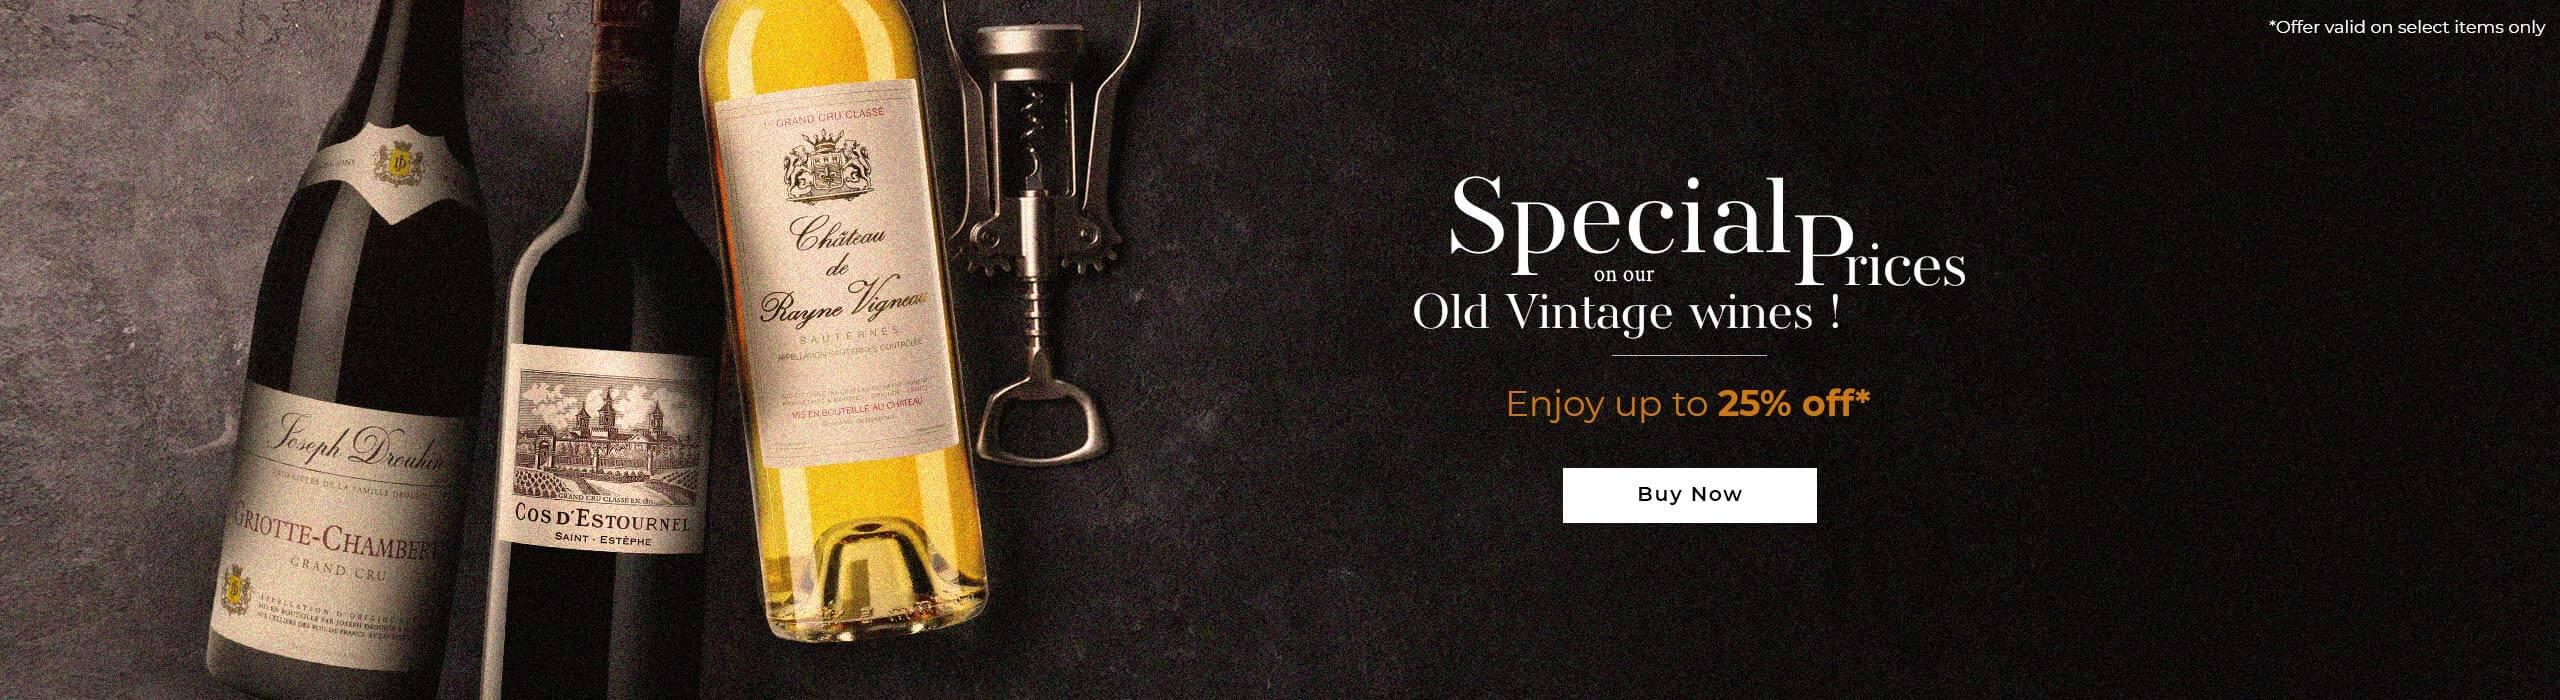 Enjoy up to 25% off Old Vintage wines